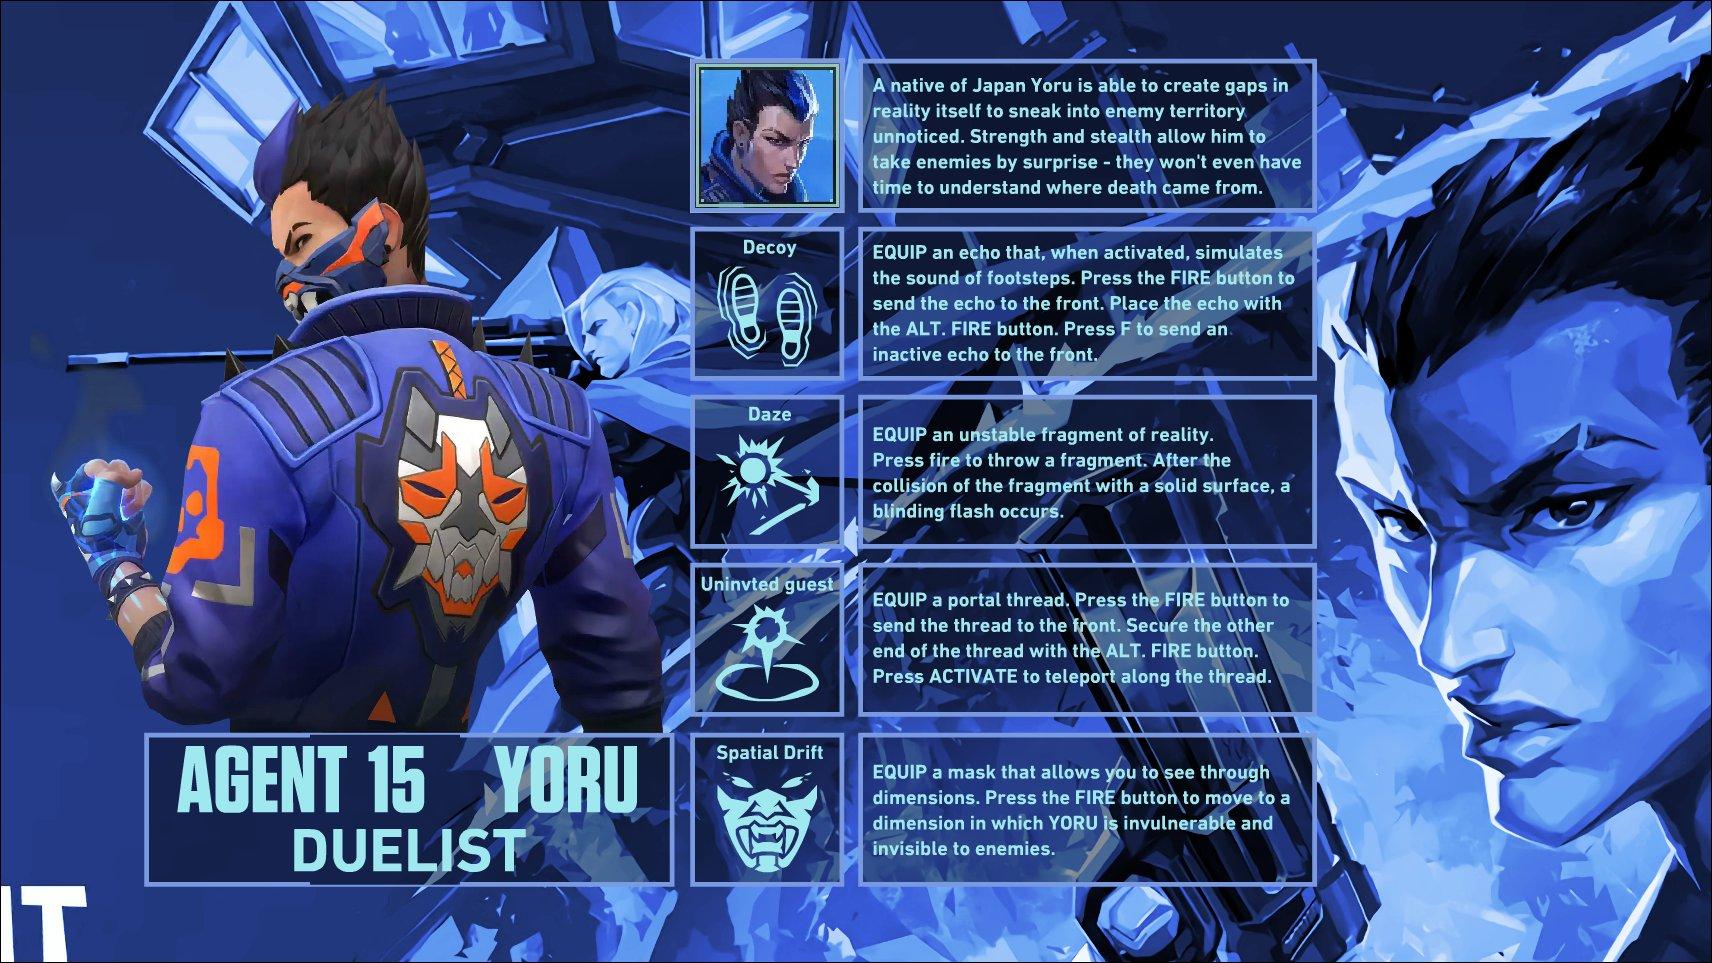 yoru_ability